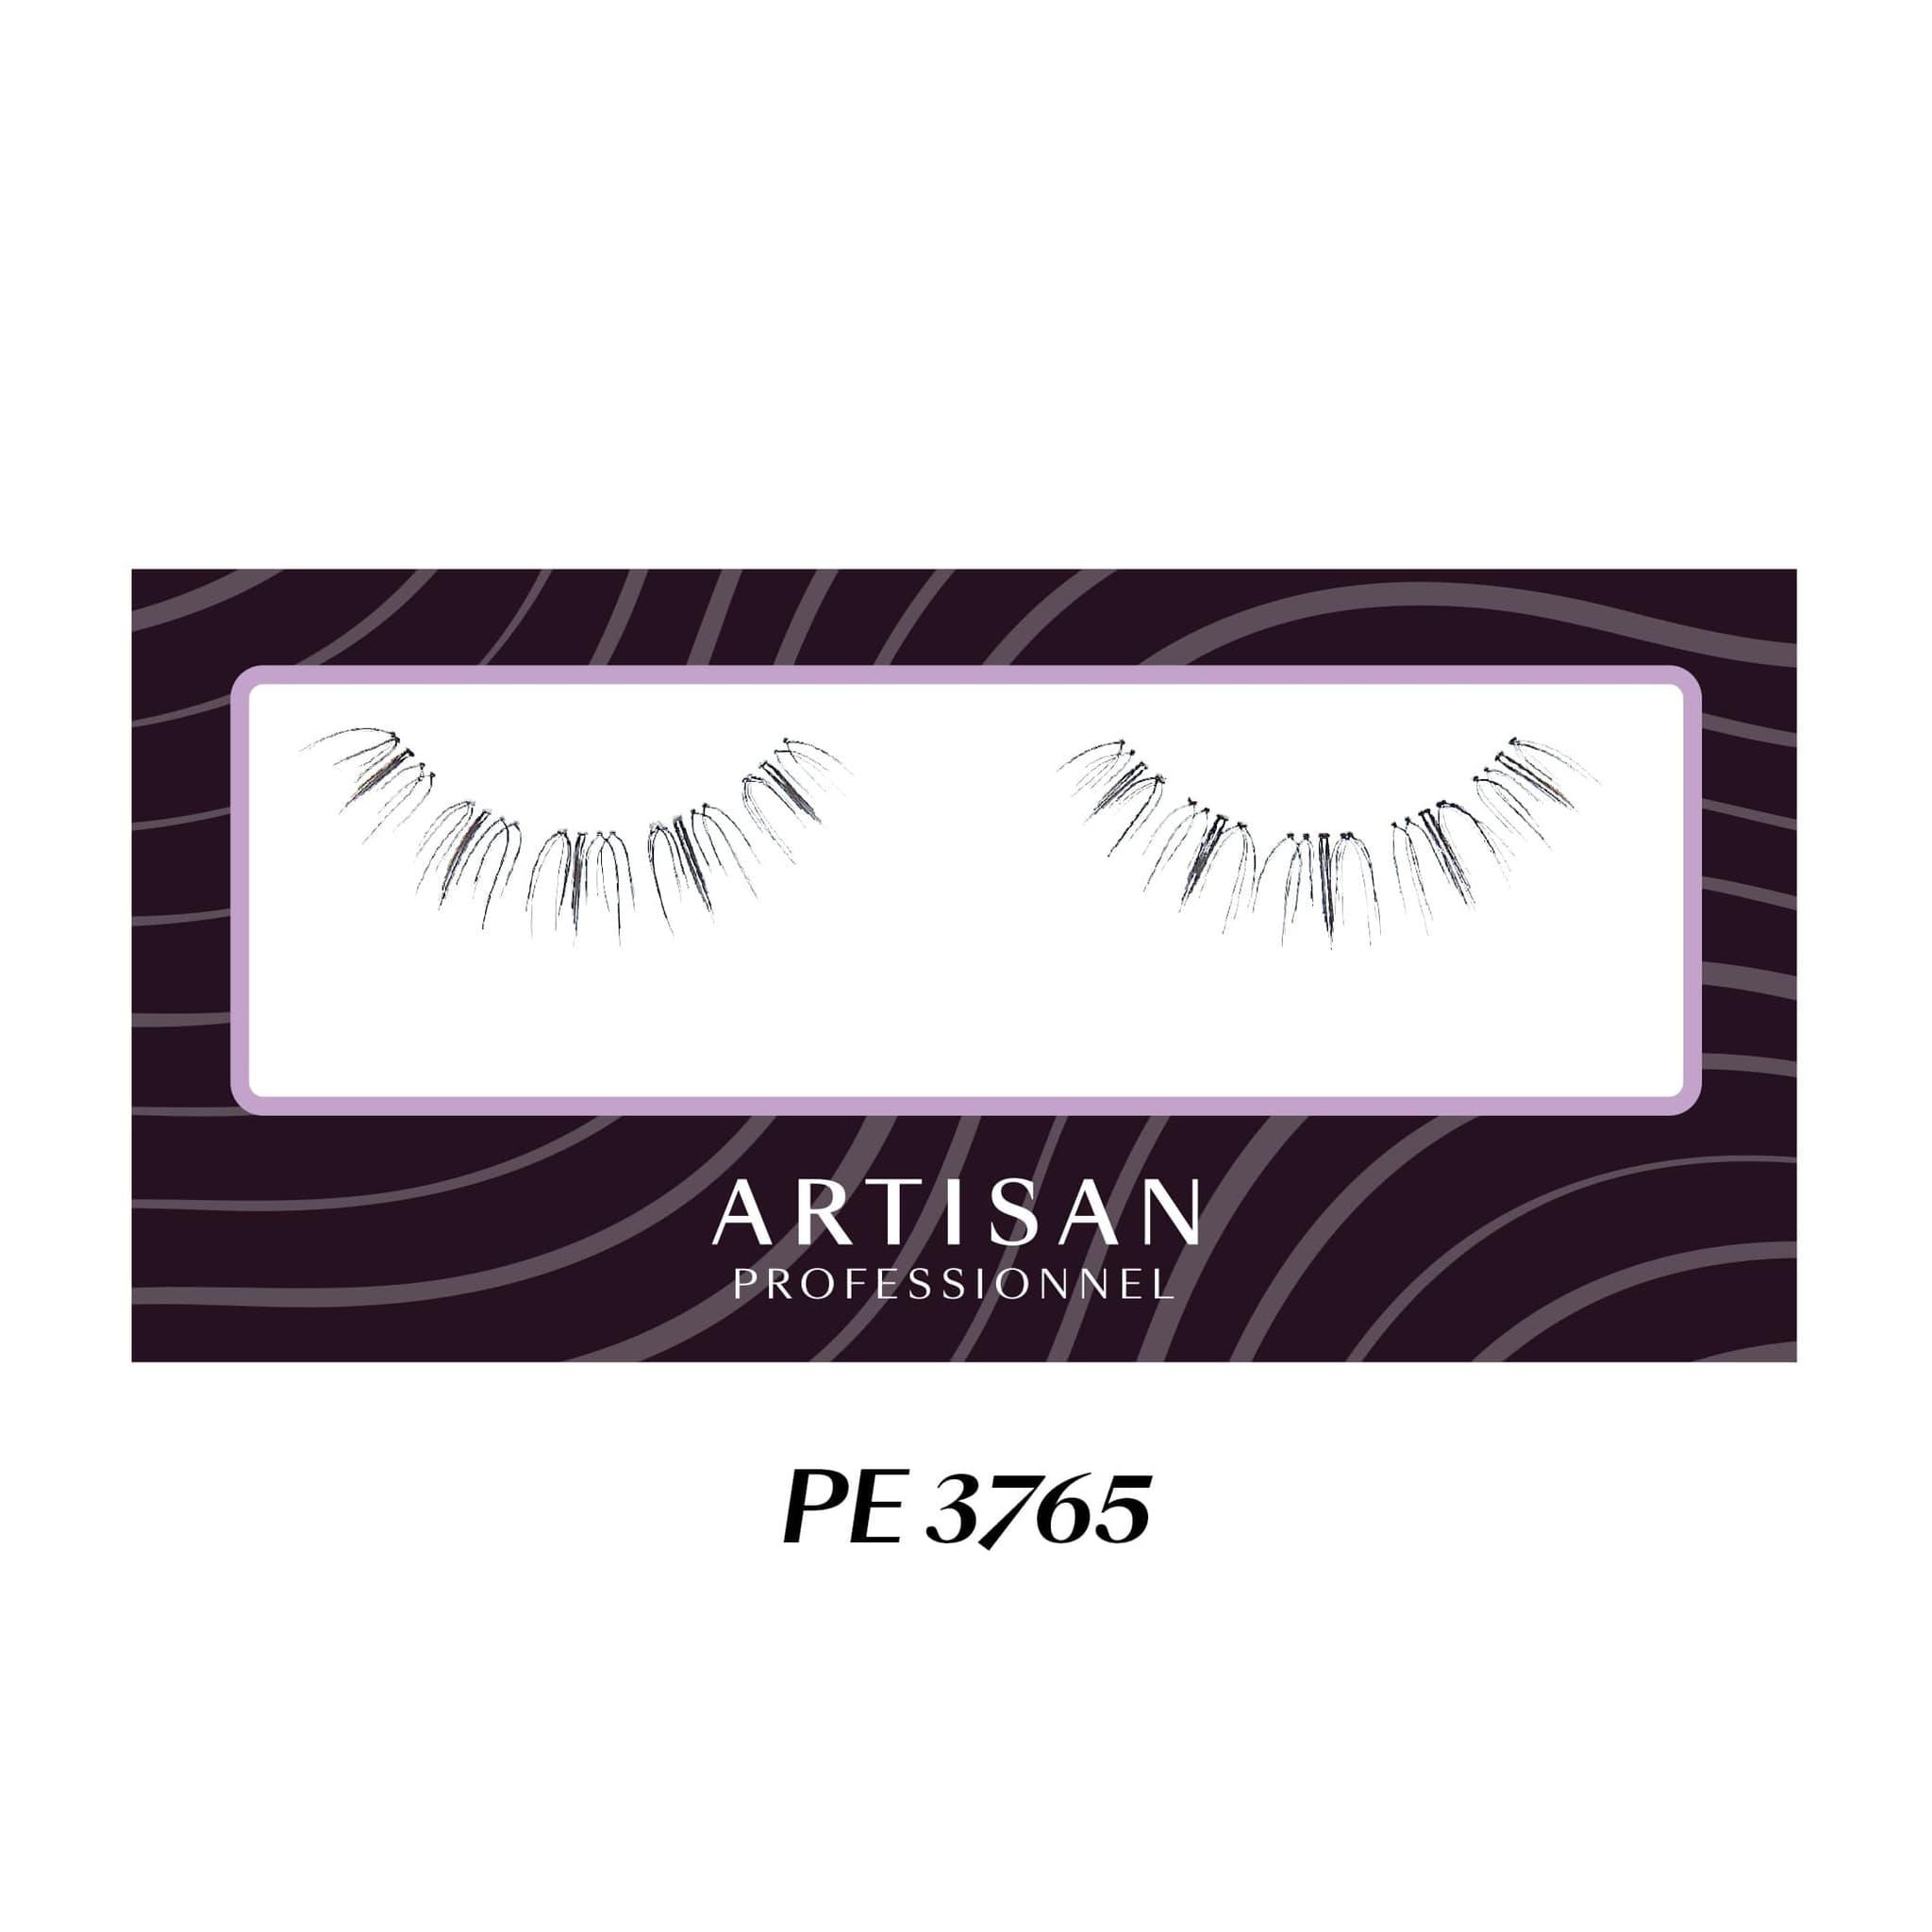 ARTISAN - Petite 3765 - Bulu mata palsu bawah thumbnail